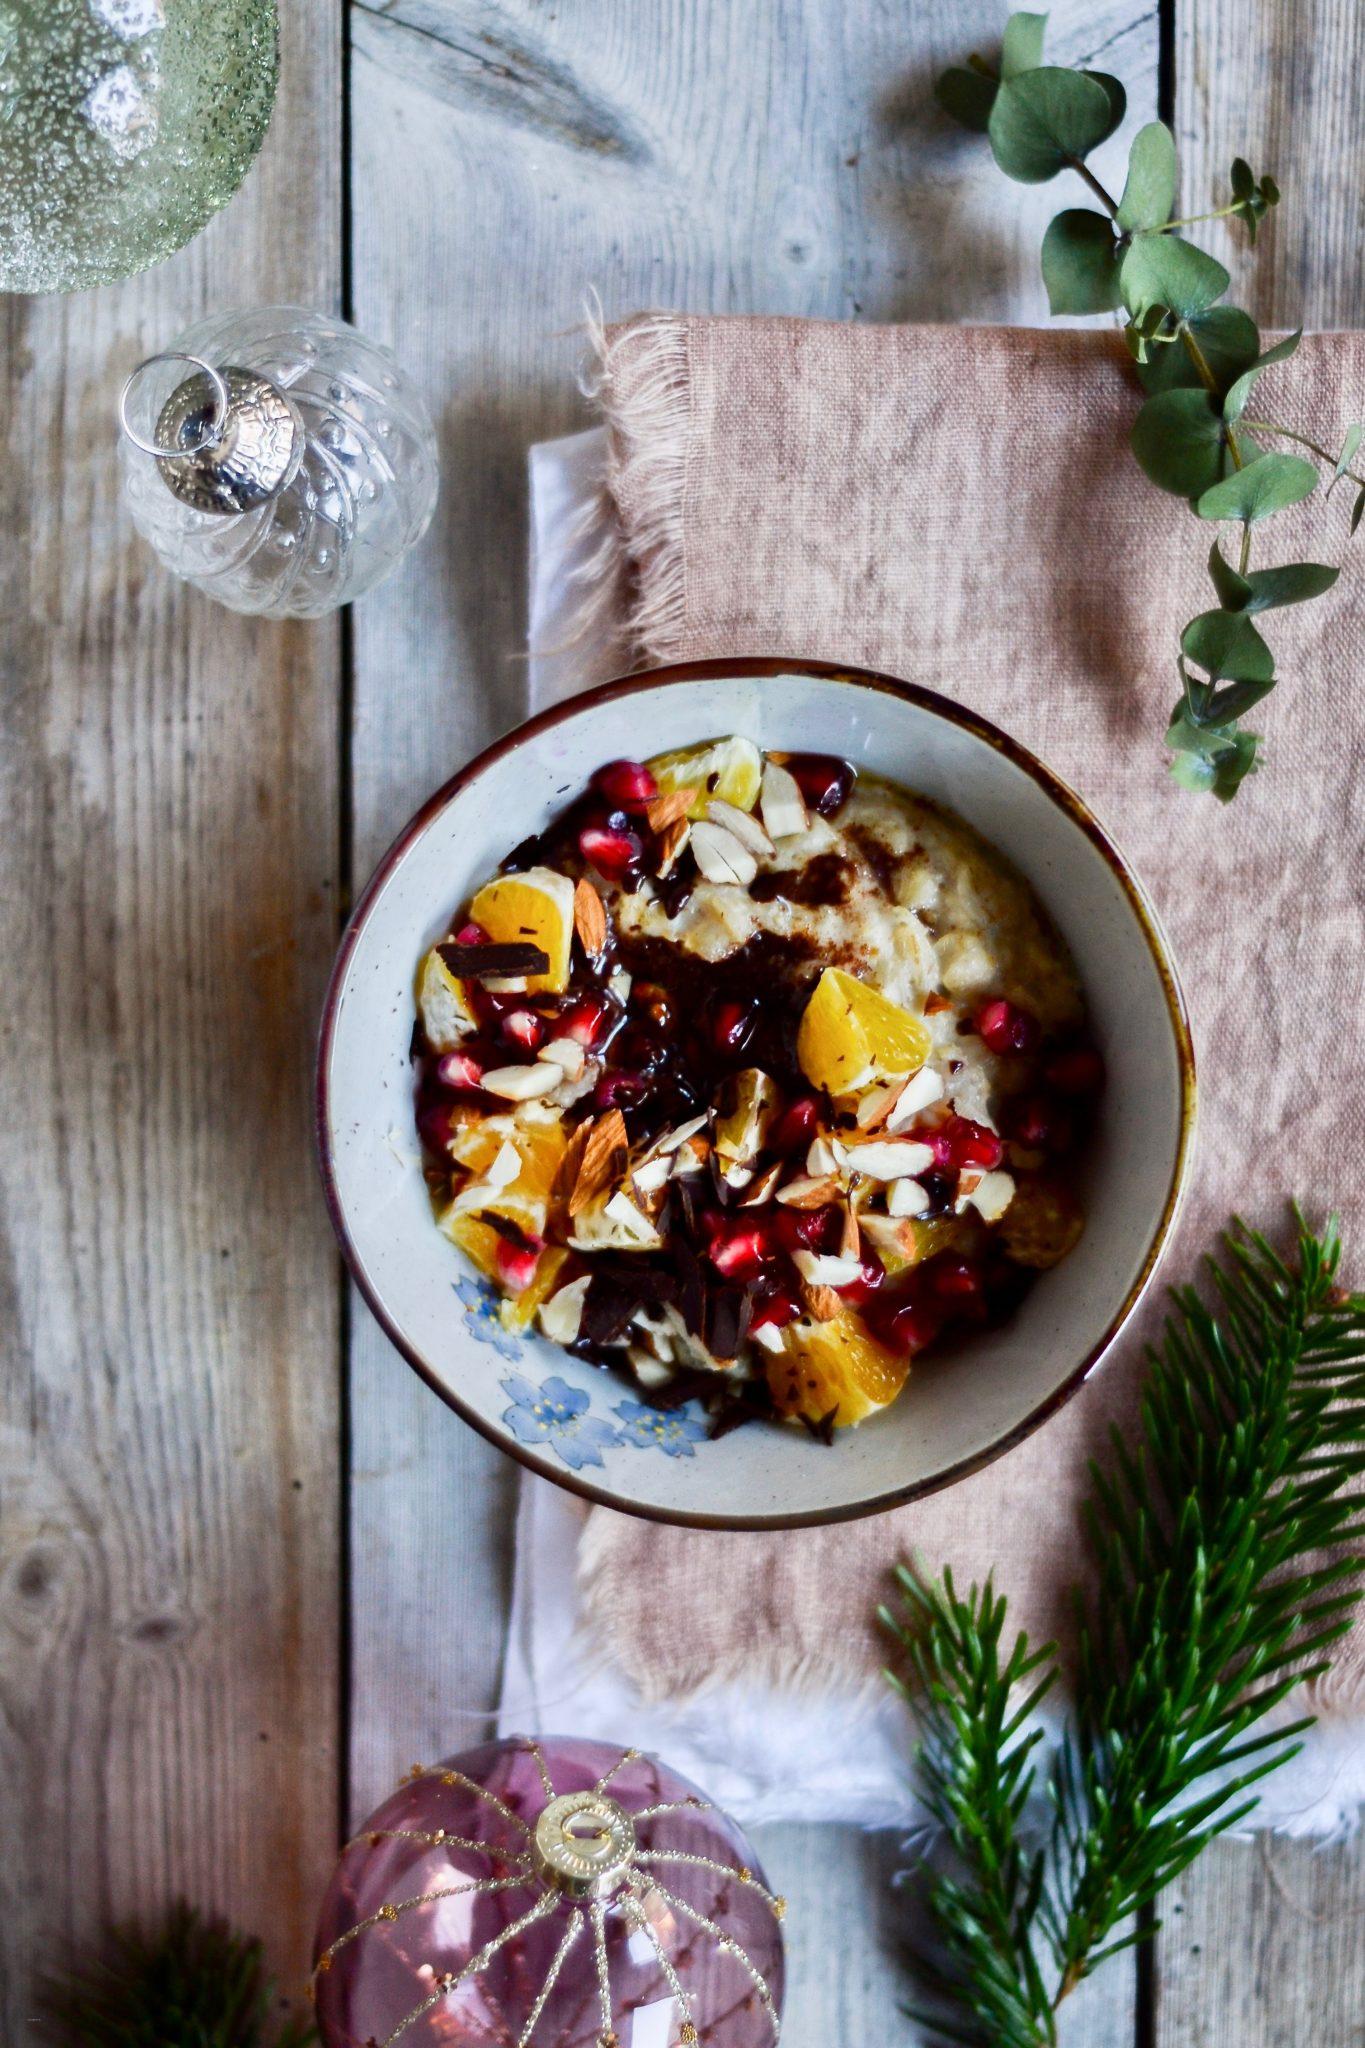 julegroed-med-julekrydderier-appelsin-granataeble-mandler-smoerklat-2 2